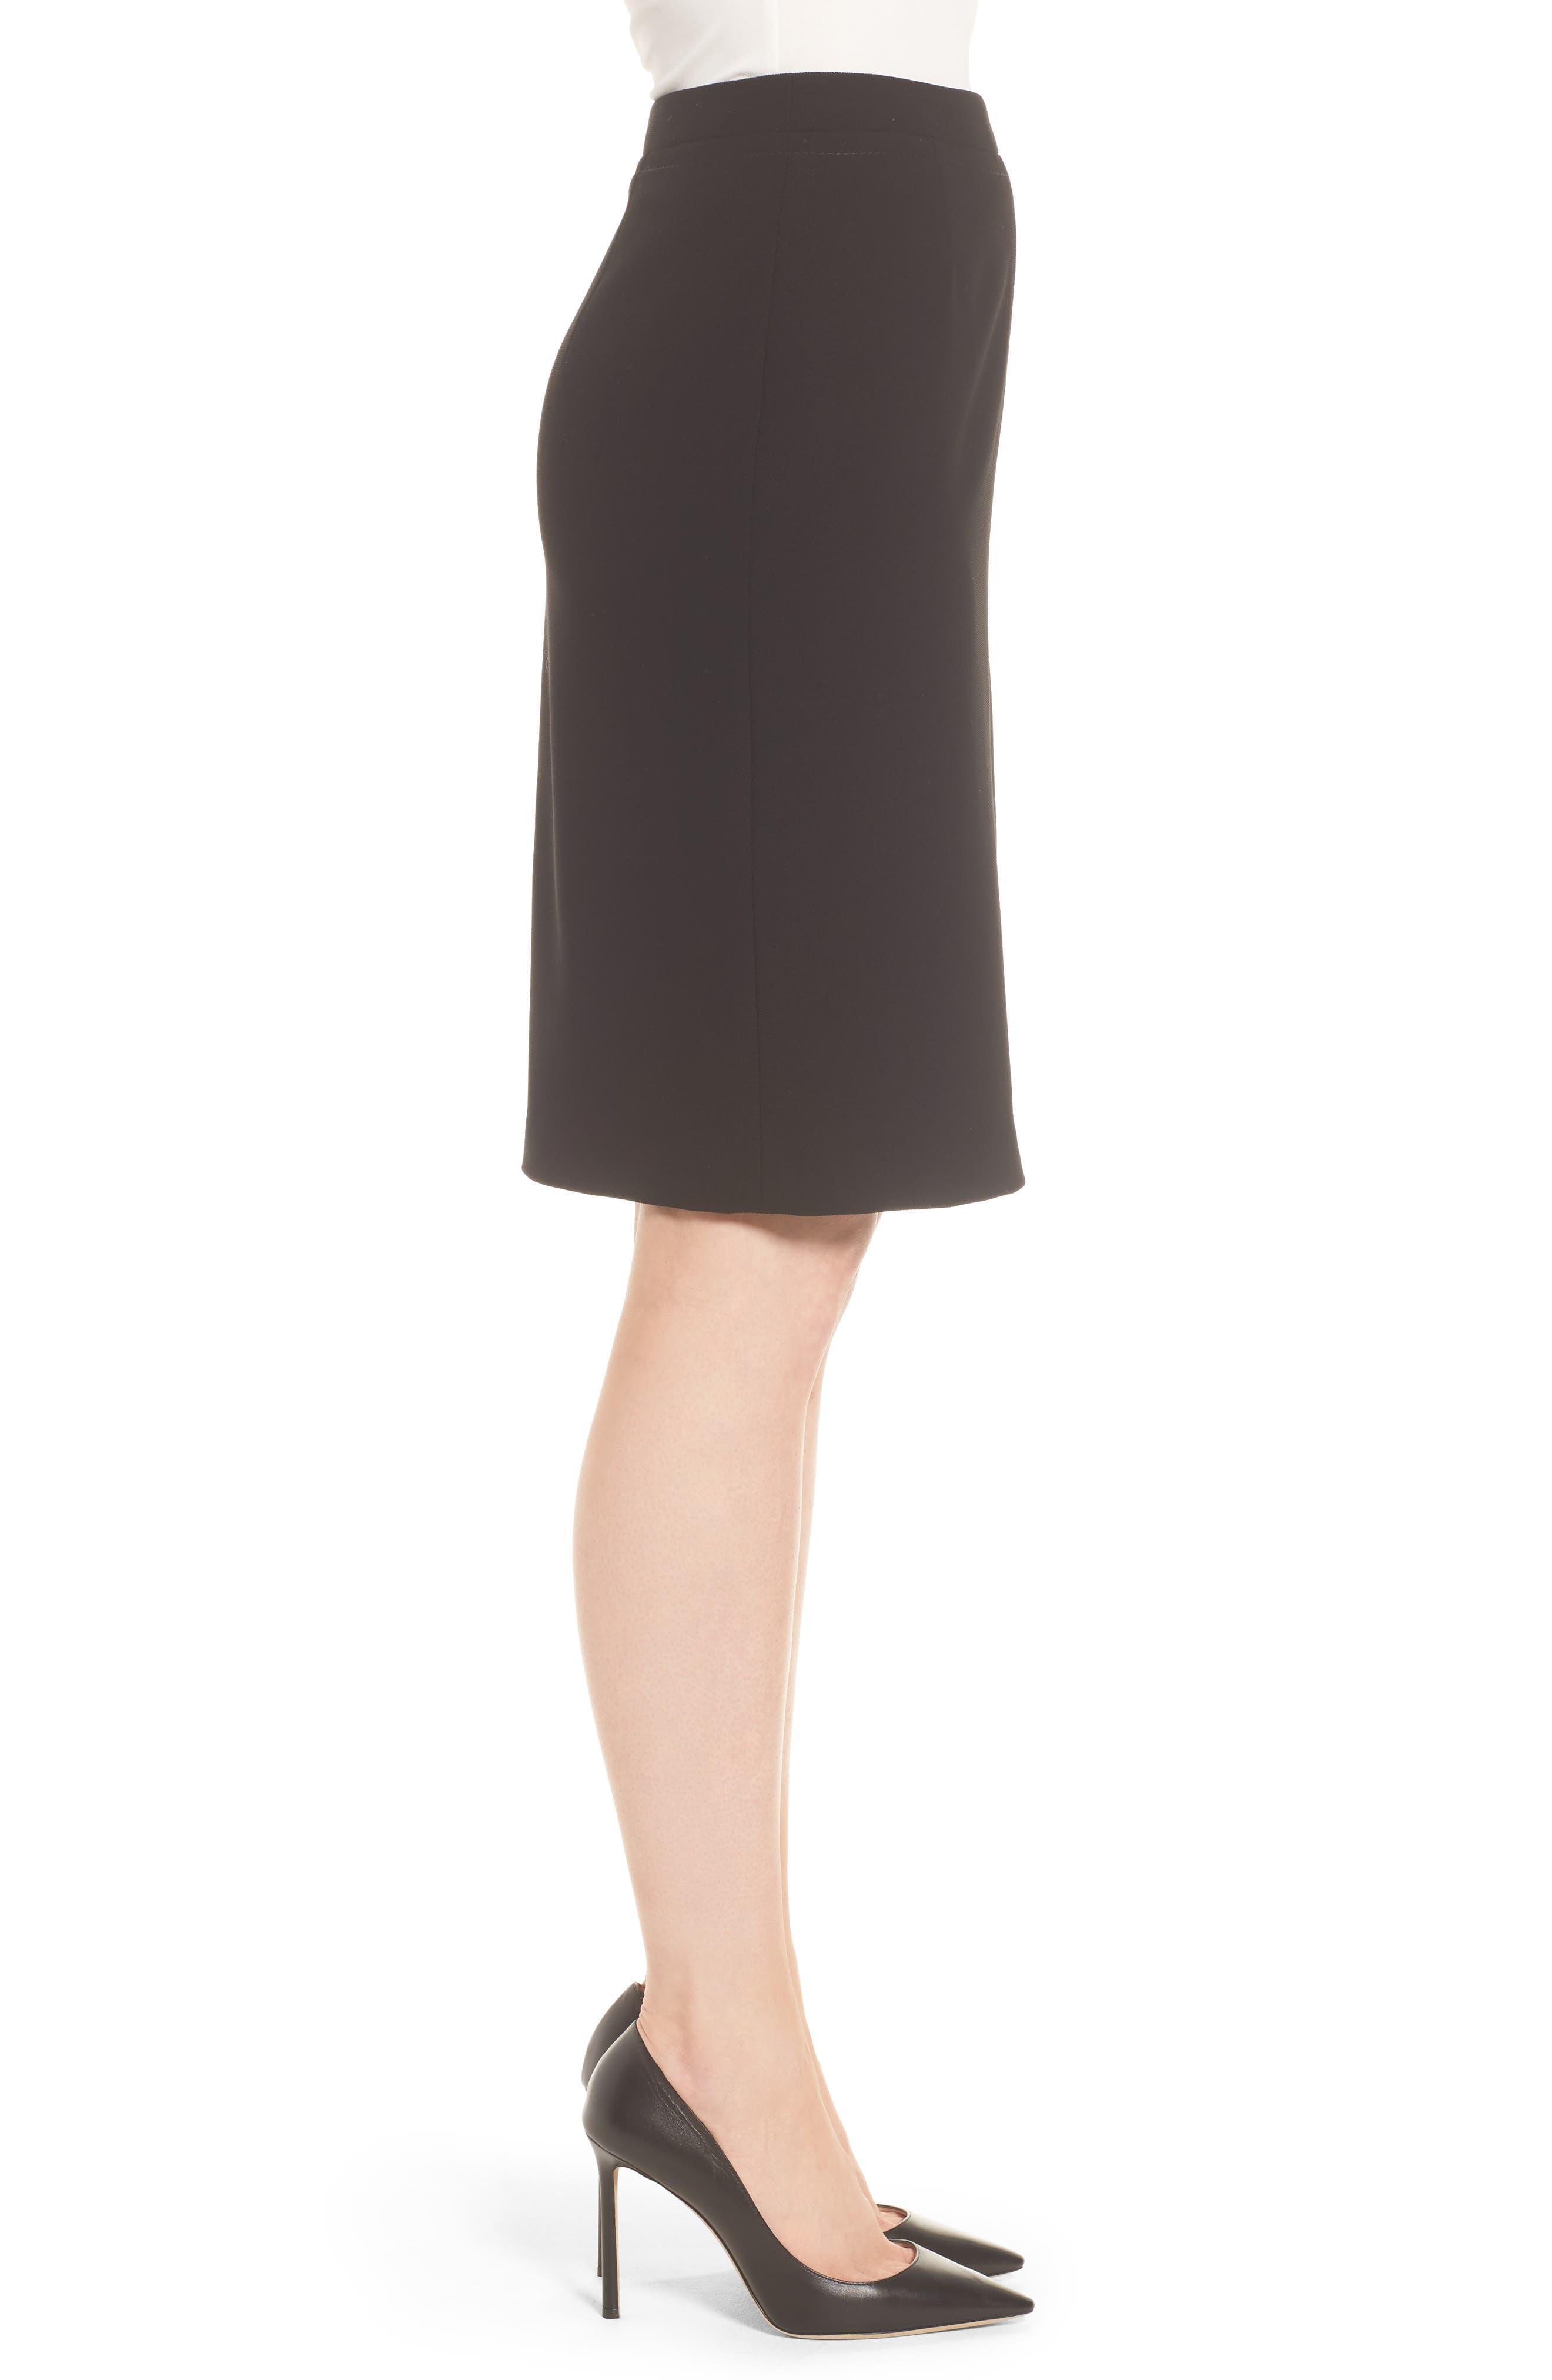 Vuriona Pencil Skirt,                             Alternate thumbnail 3, color,                             001